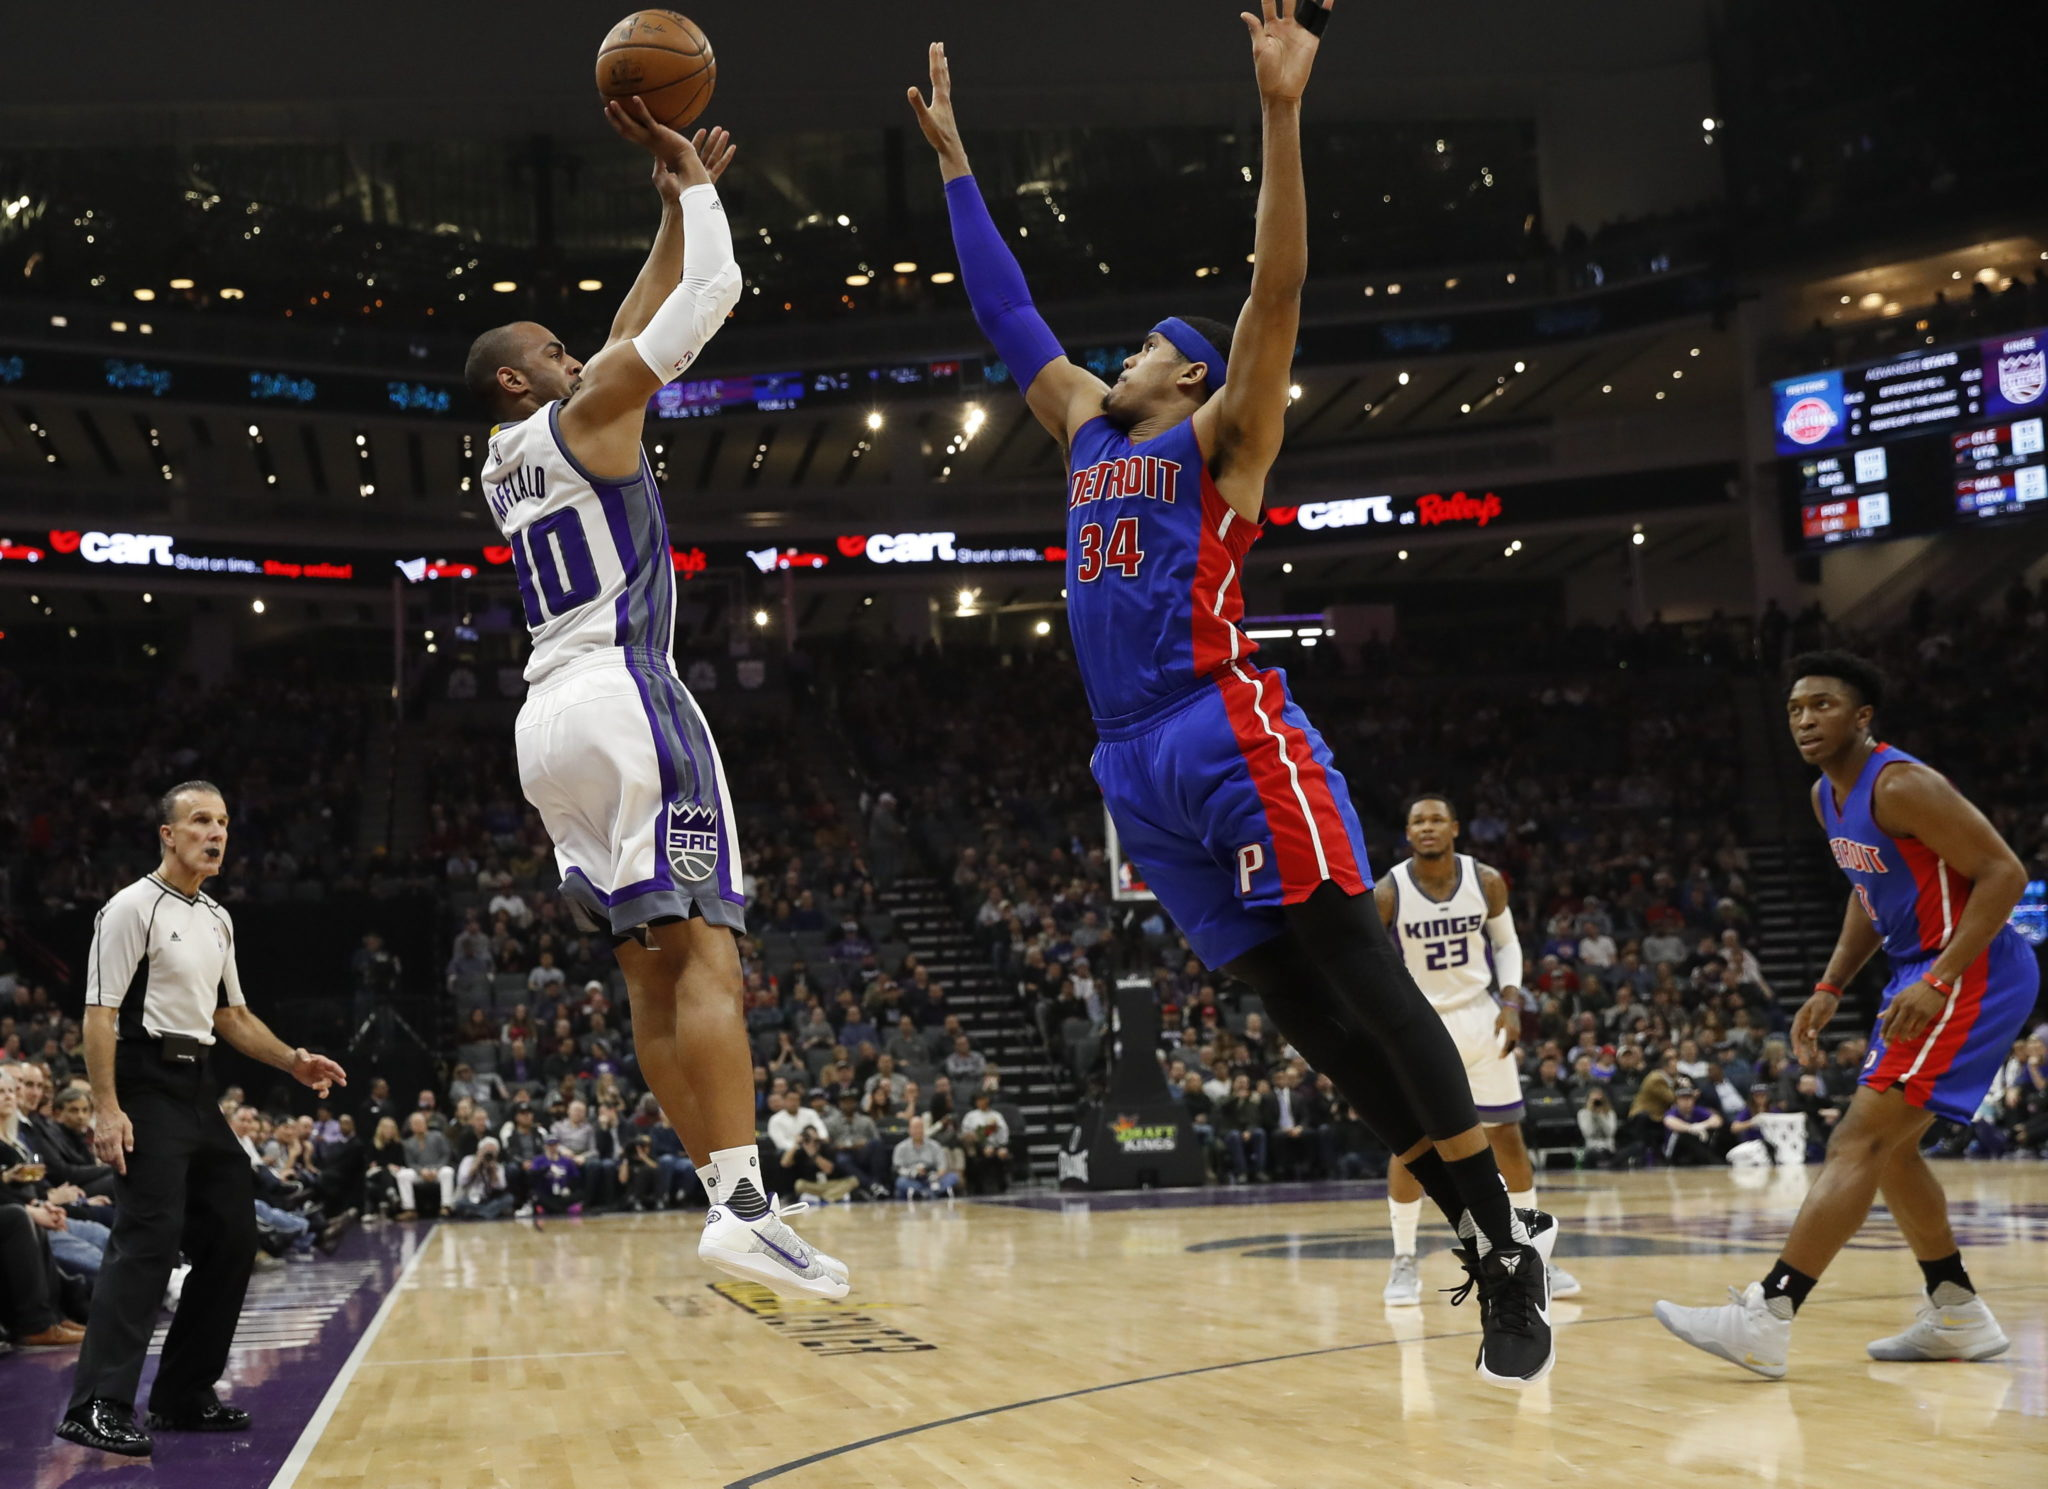 USA: rozgrywki NBA pomiędzy Detroit Pistons a Sacramento Kings w Kalifornii (foto. PAP/EPA/JOHN G. MABANGLO)